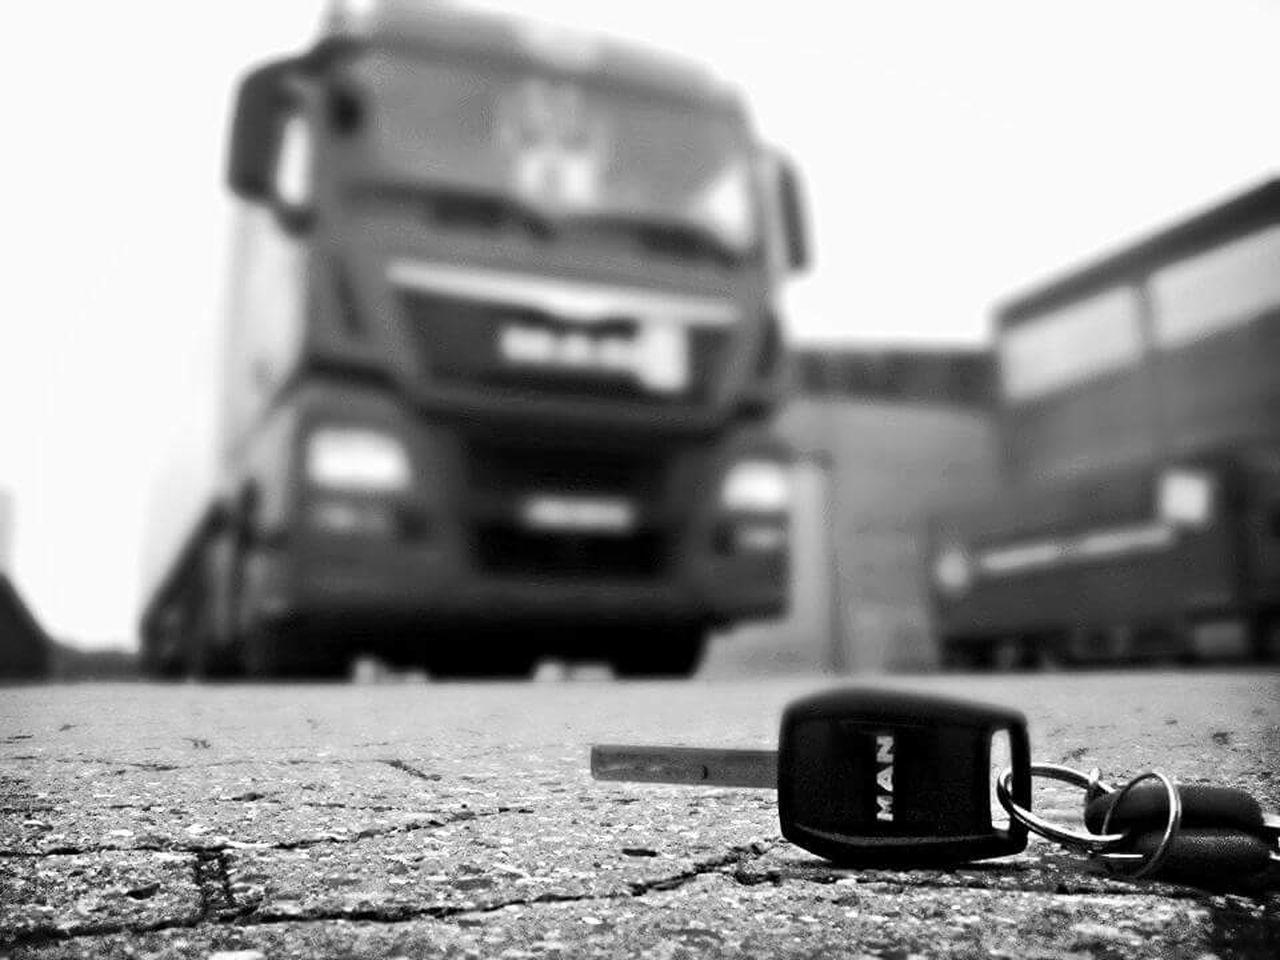 Transportation Close-up Land Vehicle Car No People Outdoors Commercial Land Vehicle Day Truck Truckerslife Trucks🚛🚒🚚⚠ Truckdriving Man Man Tgx Keys Keys Photography